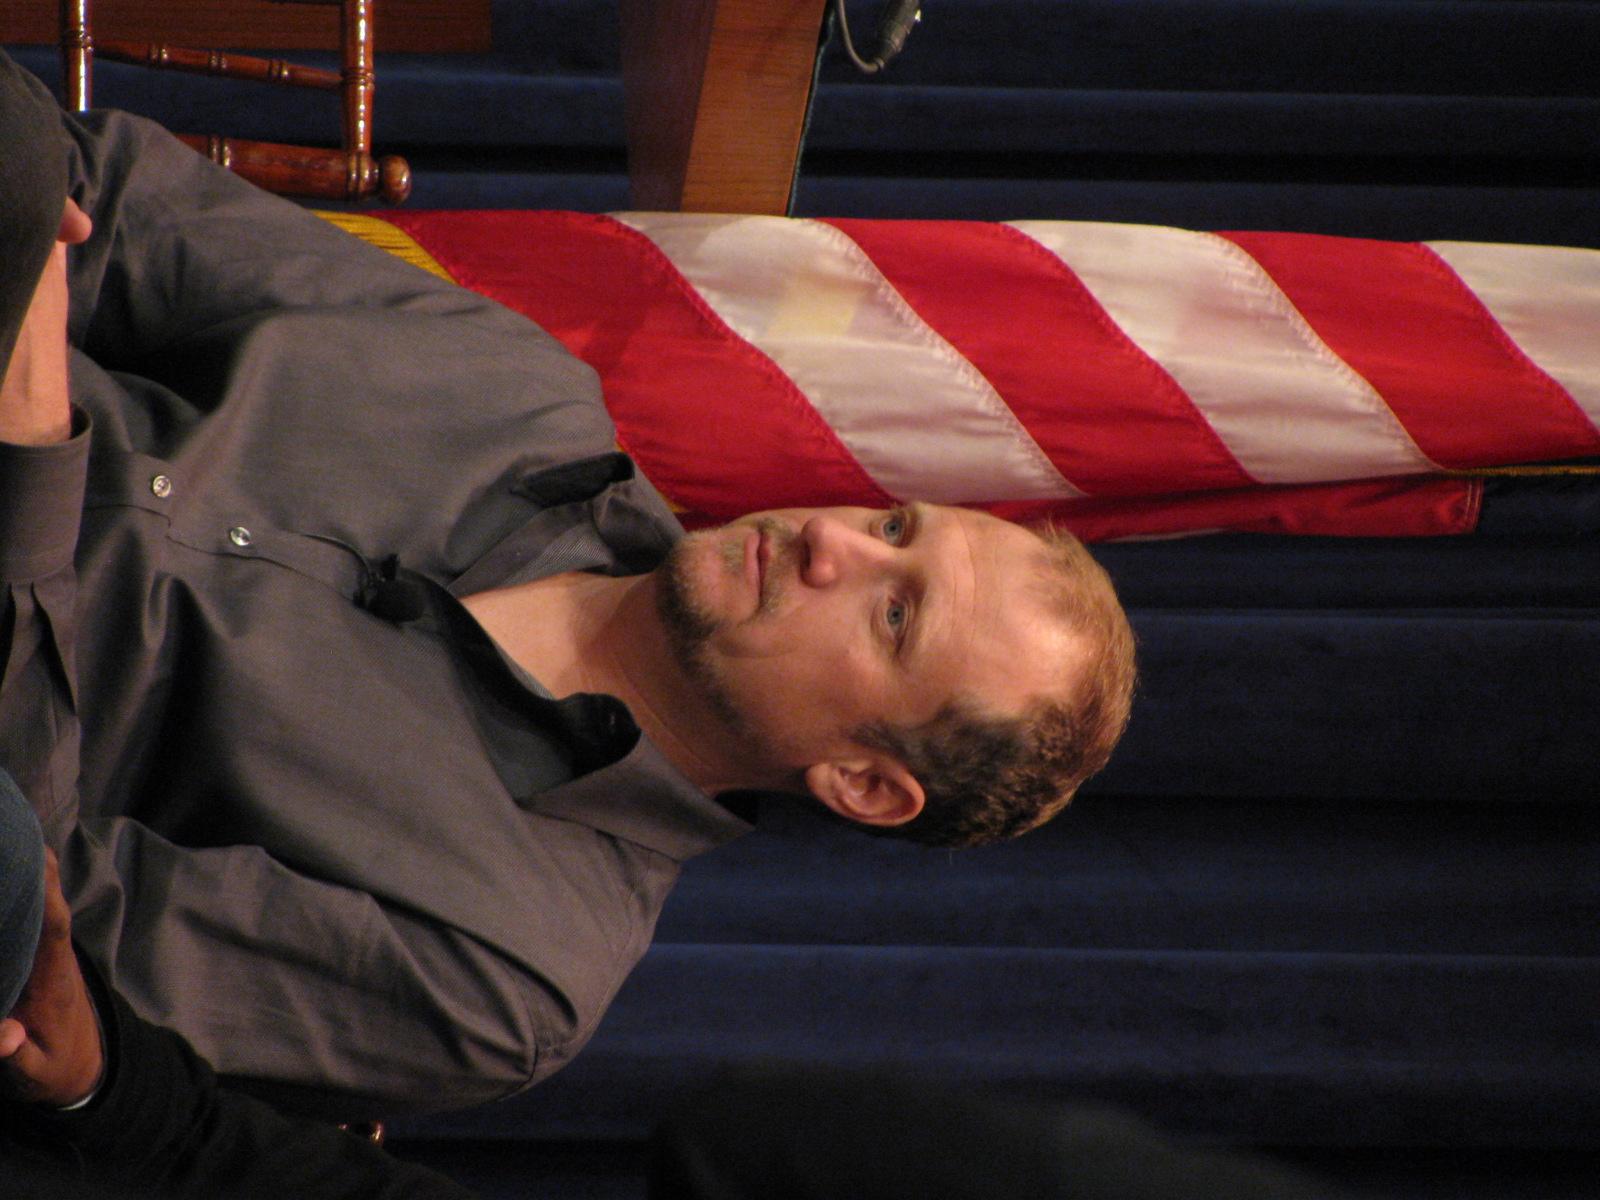 Image of Trevor Paglen from Wikidata